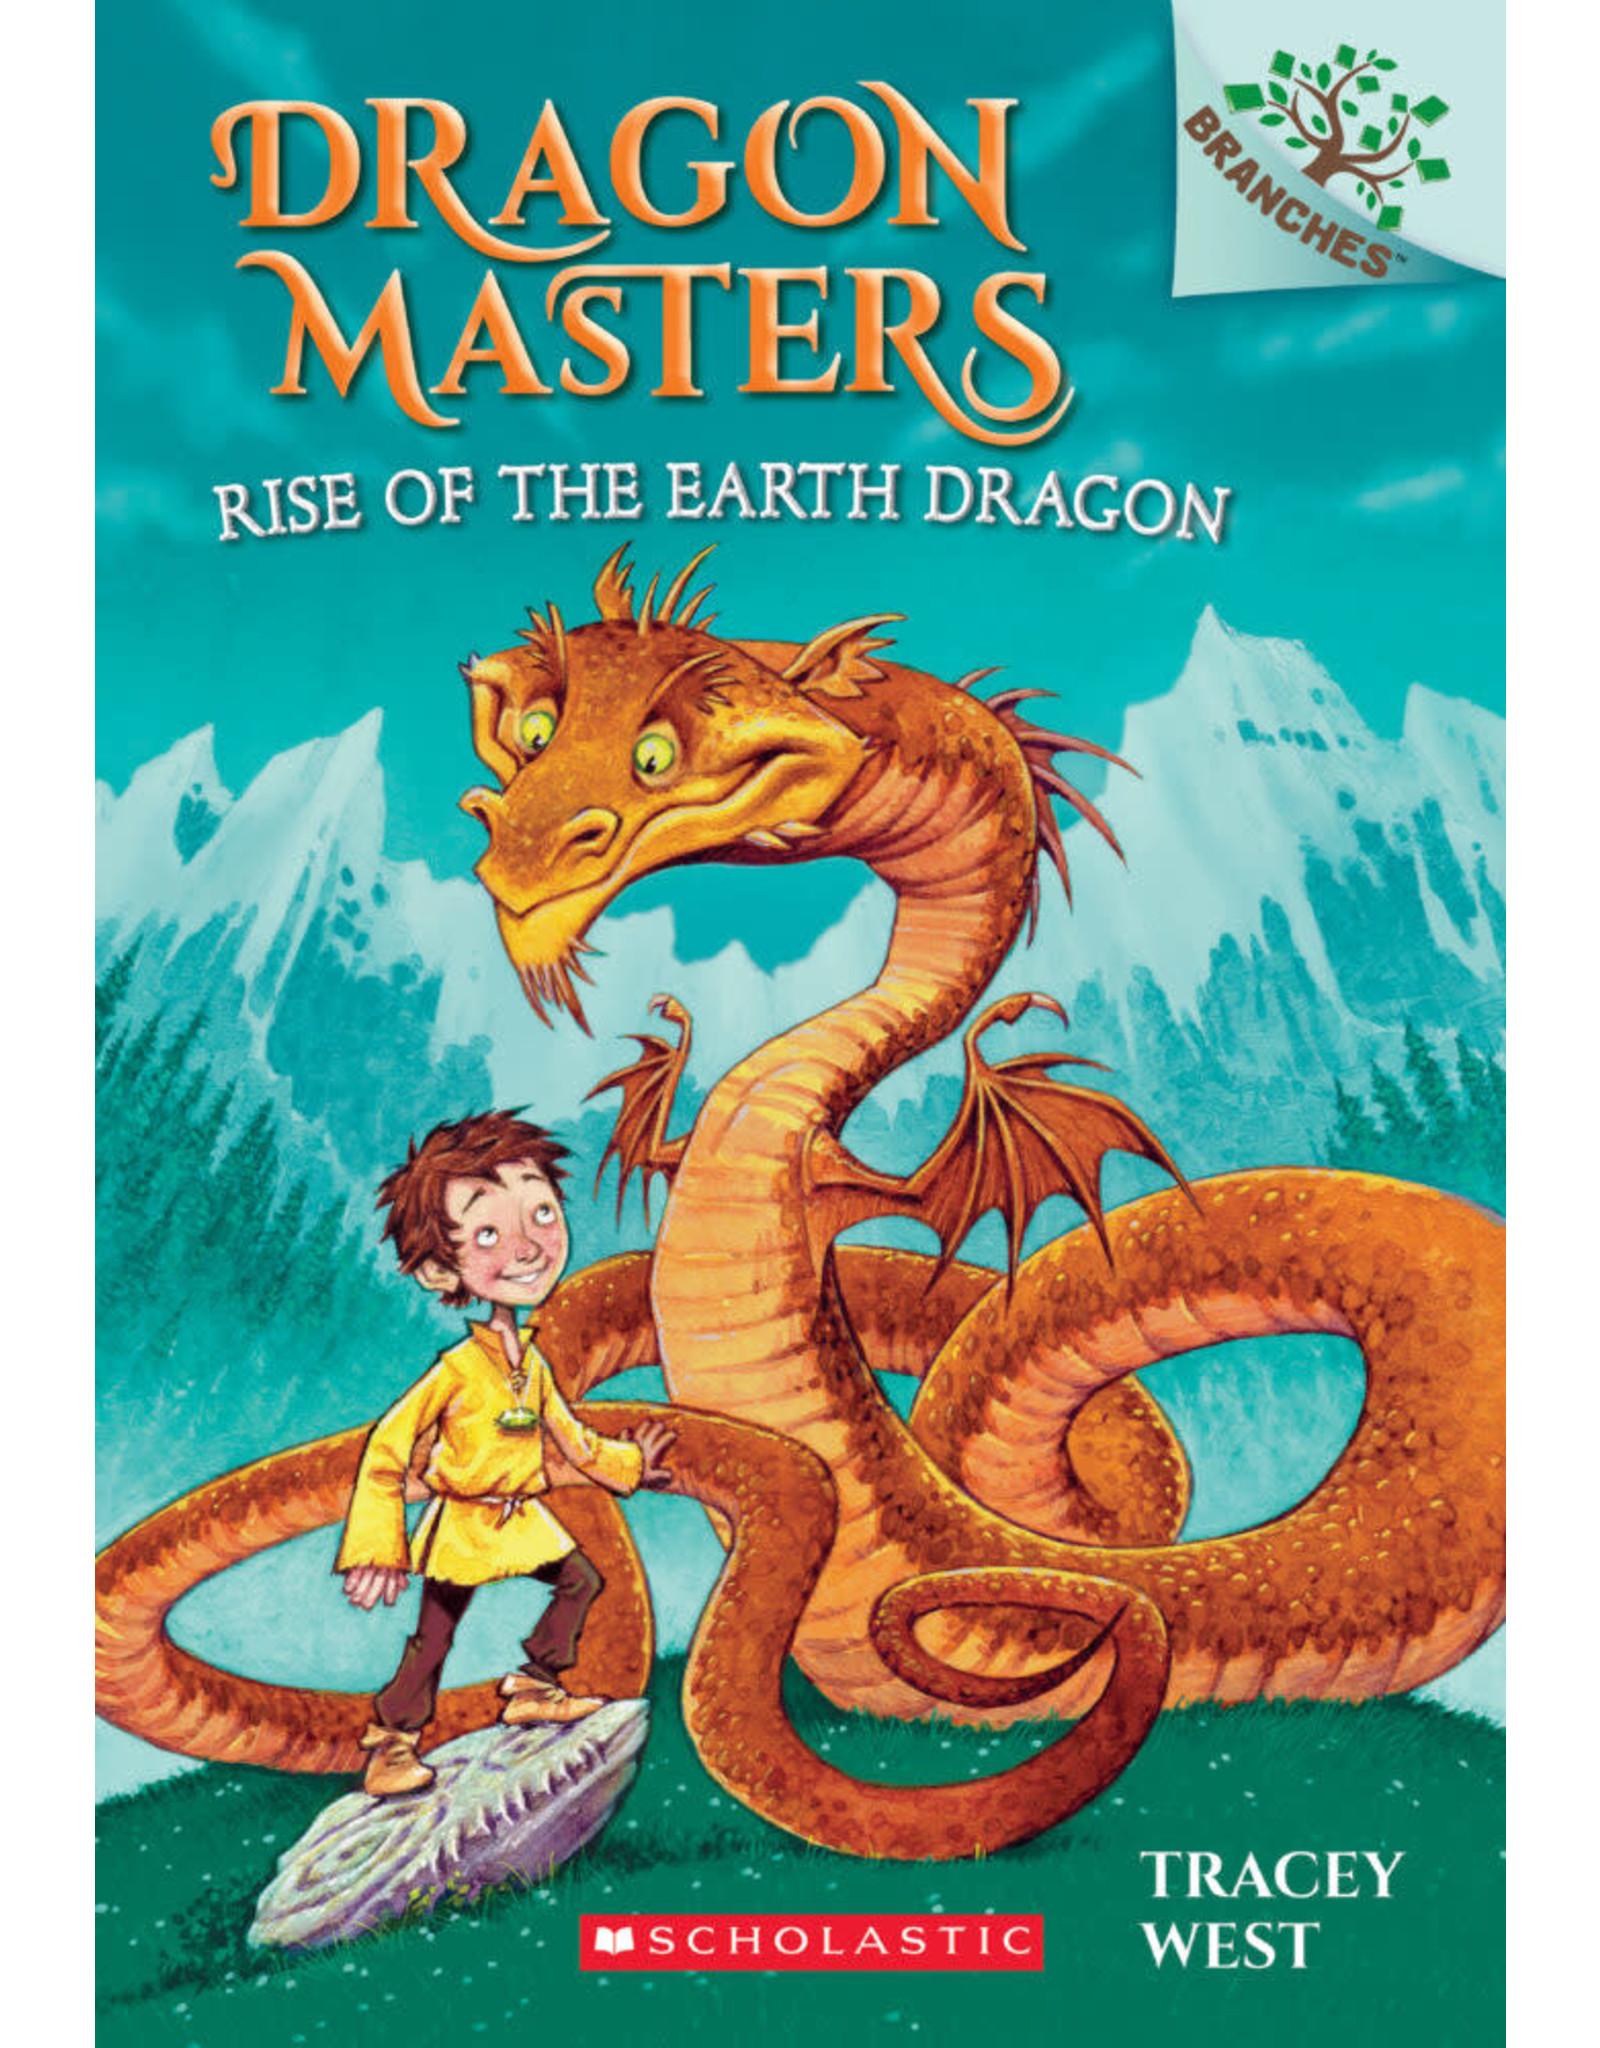 SCHOLASTIC INC. DRAGON MASTERS #1 RISE OF THE EARTH DRAGON